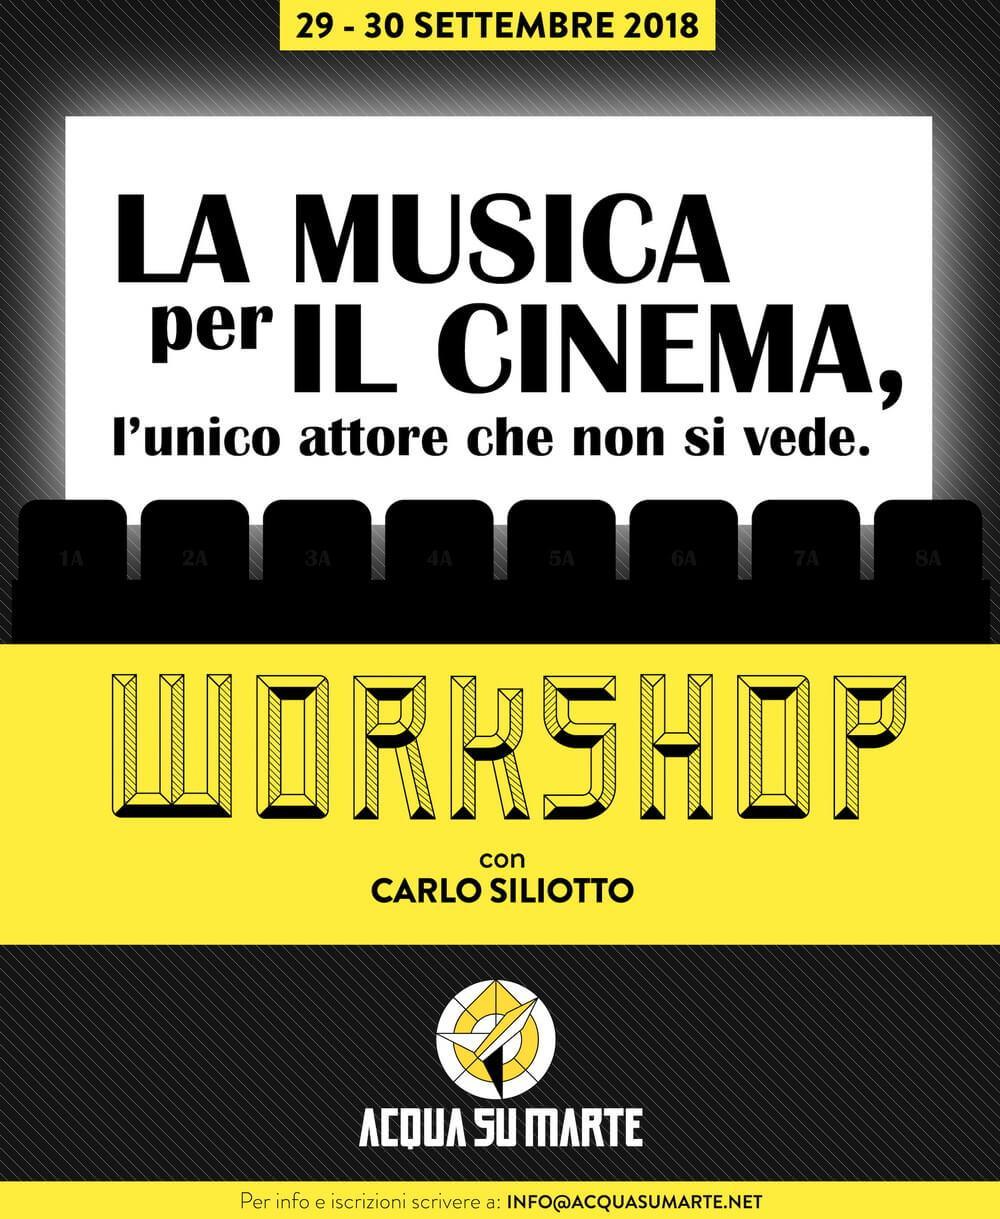 Workshop Carlo Silotto